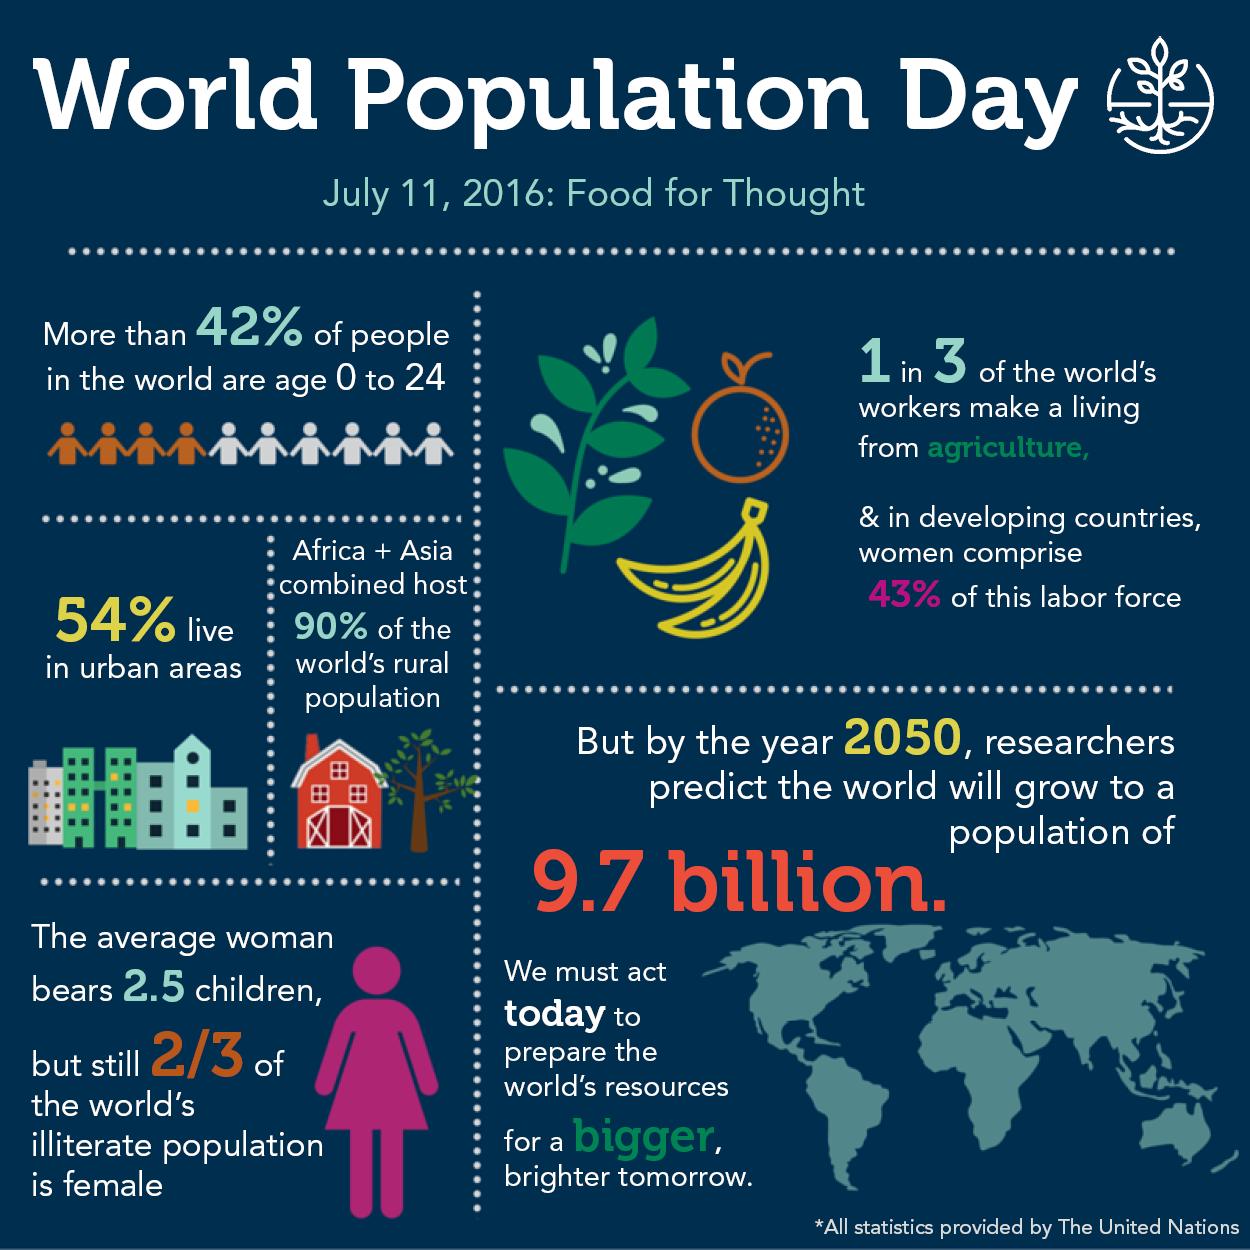 World Population Day 2016 | CNFA